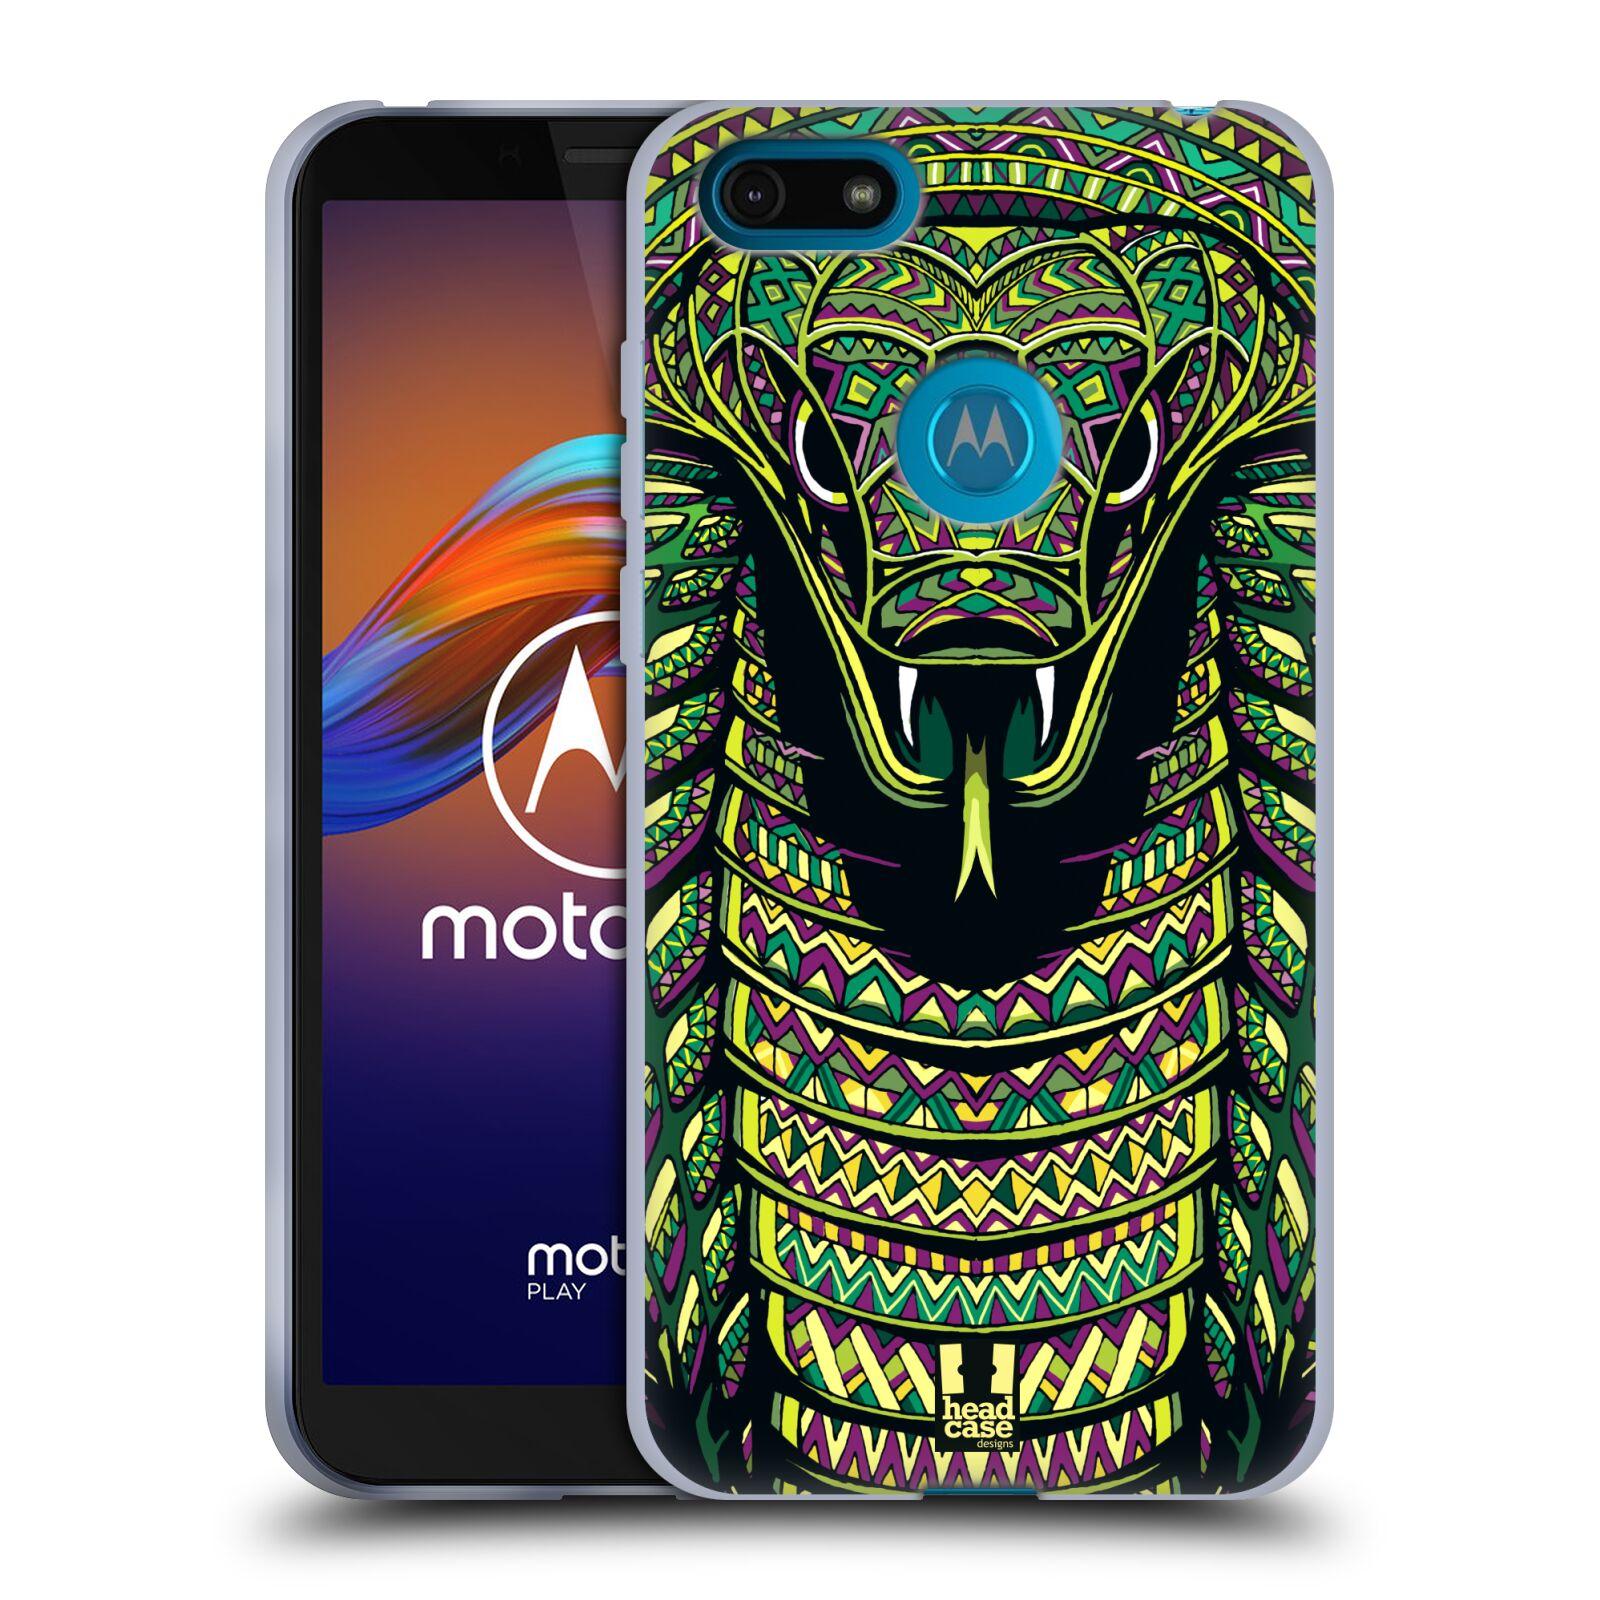 Silikonové pouzdro na mobil Motorola Moto E6 Play - Head Case - AZTEC HAD